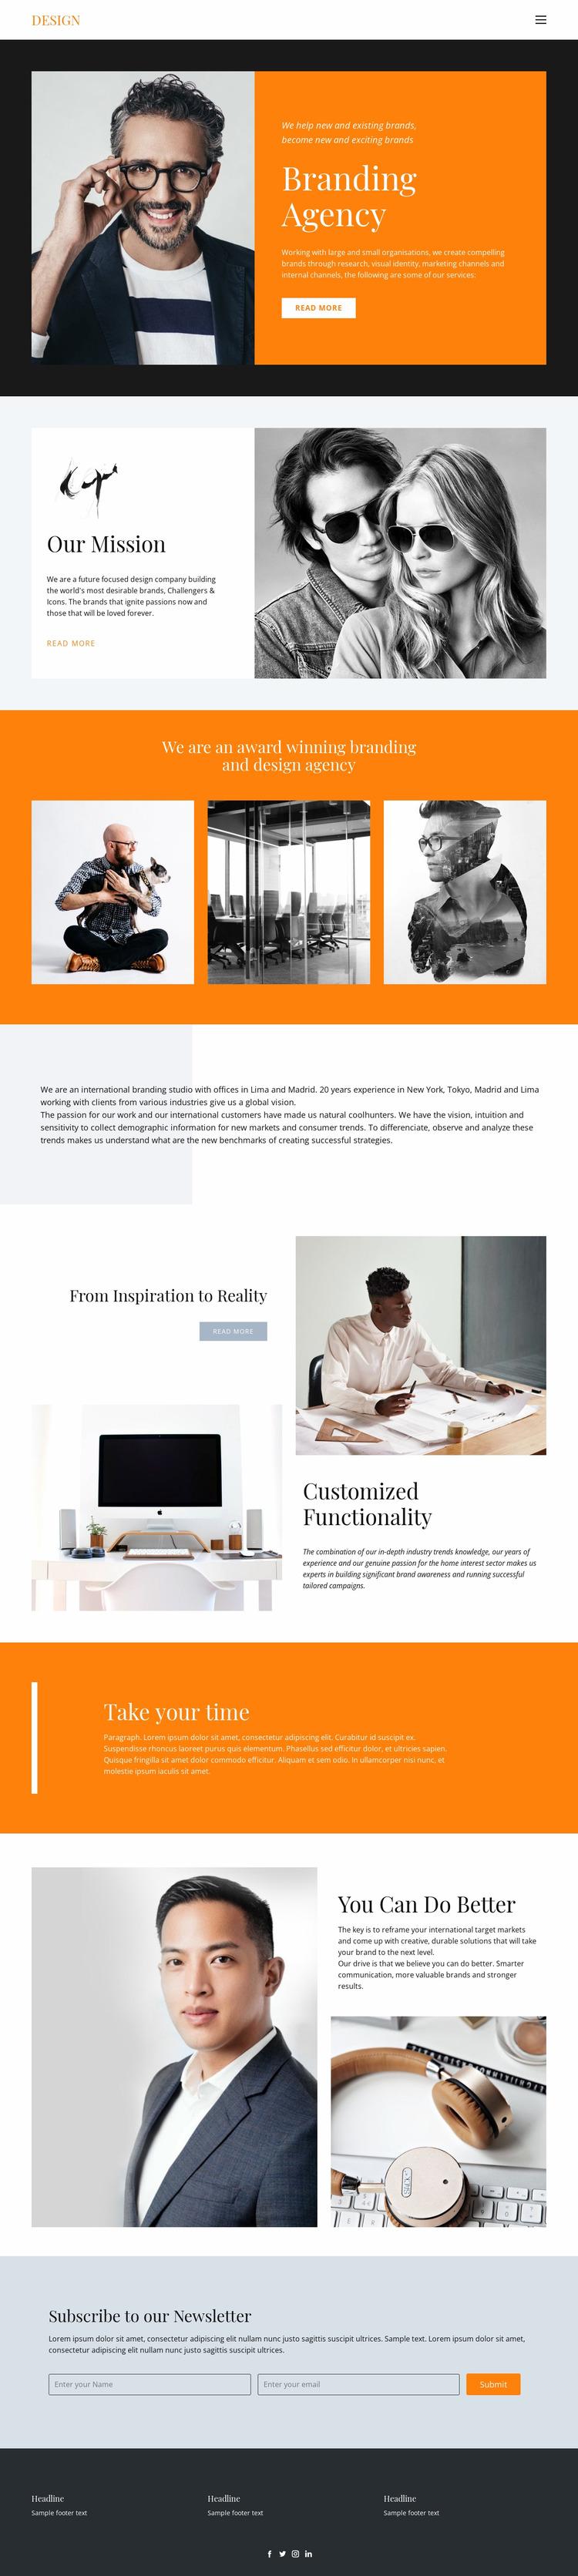 Desired results in business Html Website Builder